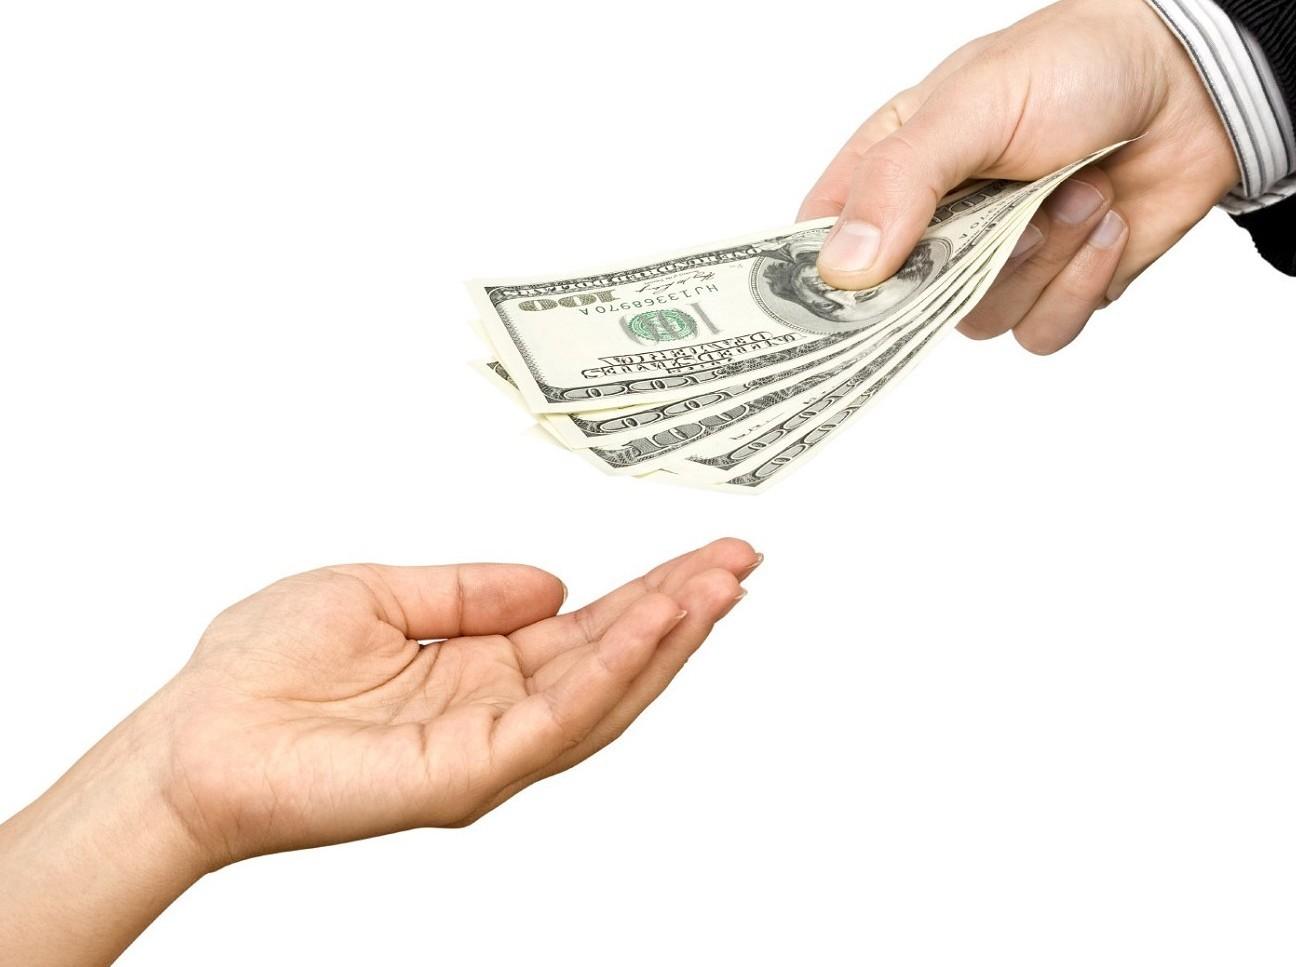 Rimborso Irpef in busta paga: 850-950 eu